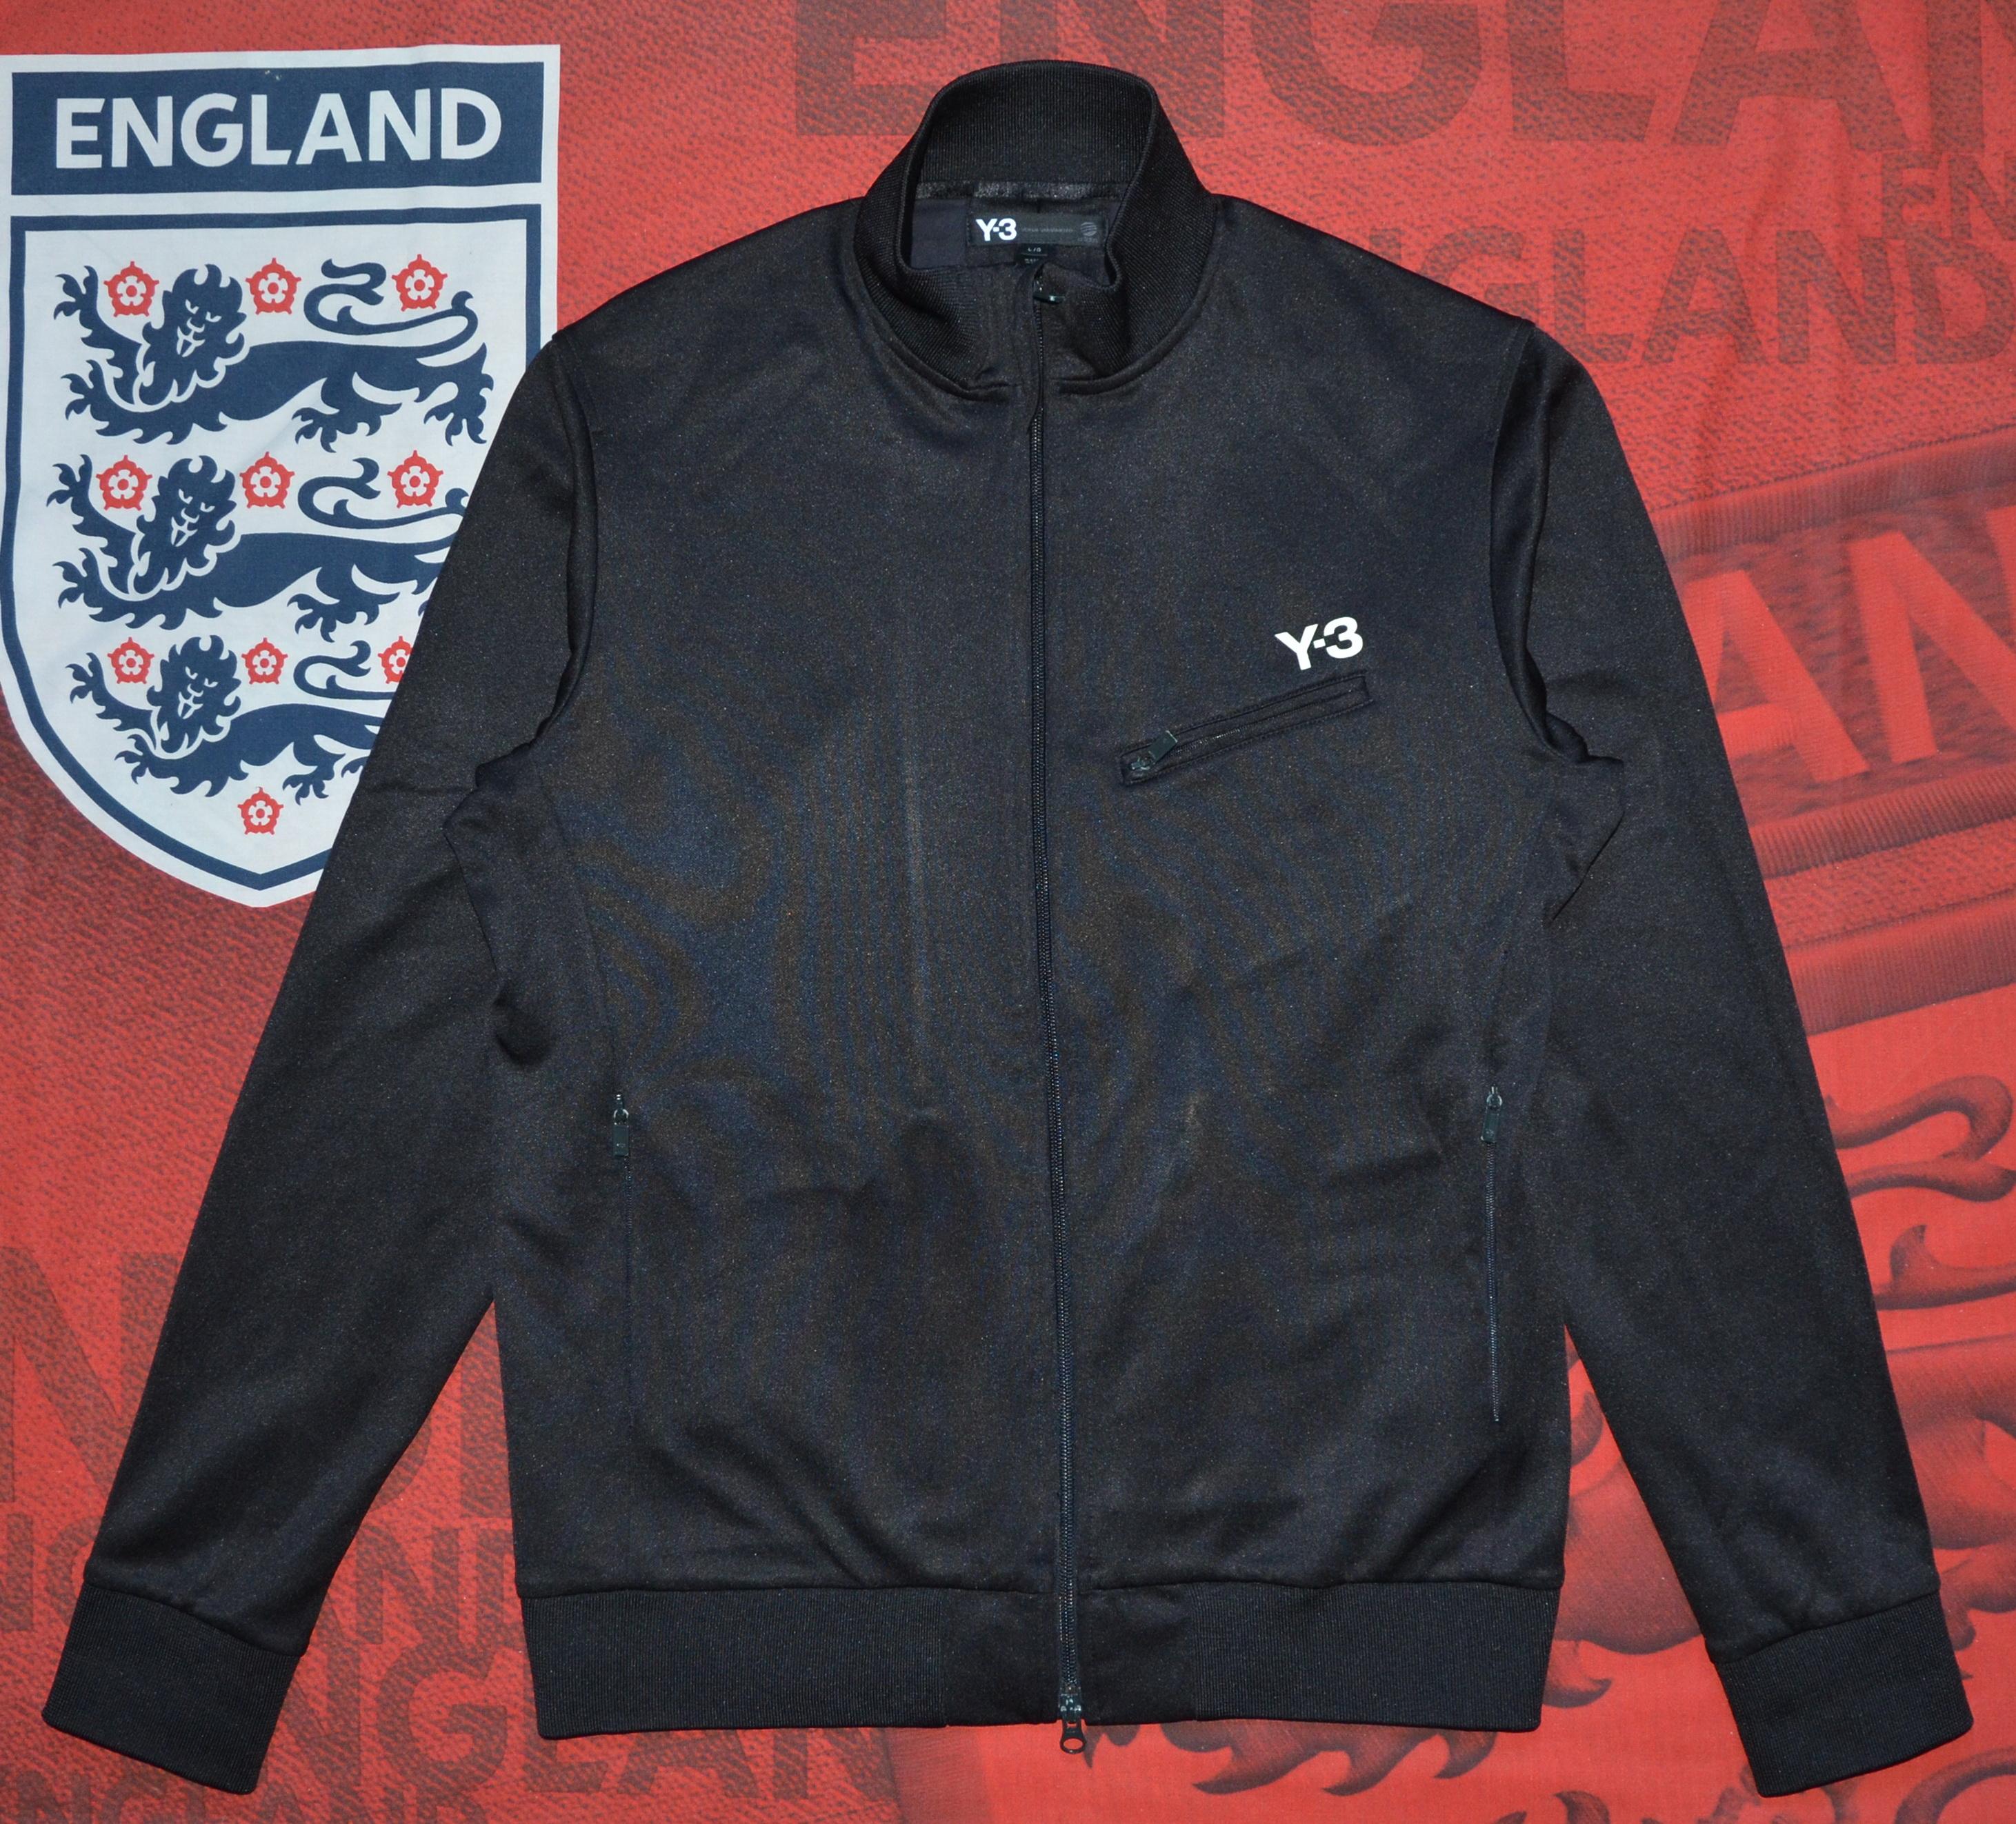 Adidas Y 3 Adidas Yohji Yamamoto Men Black Jacket Size L Grailed